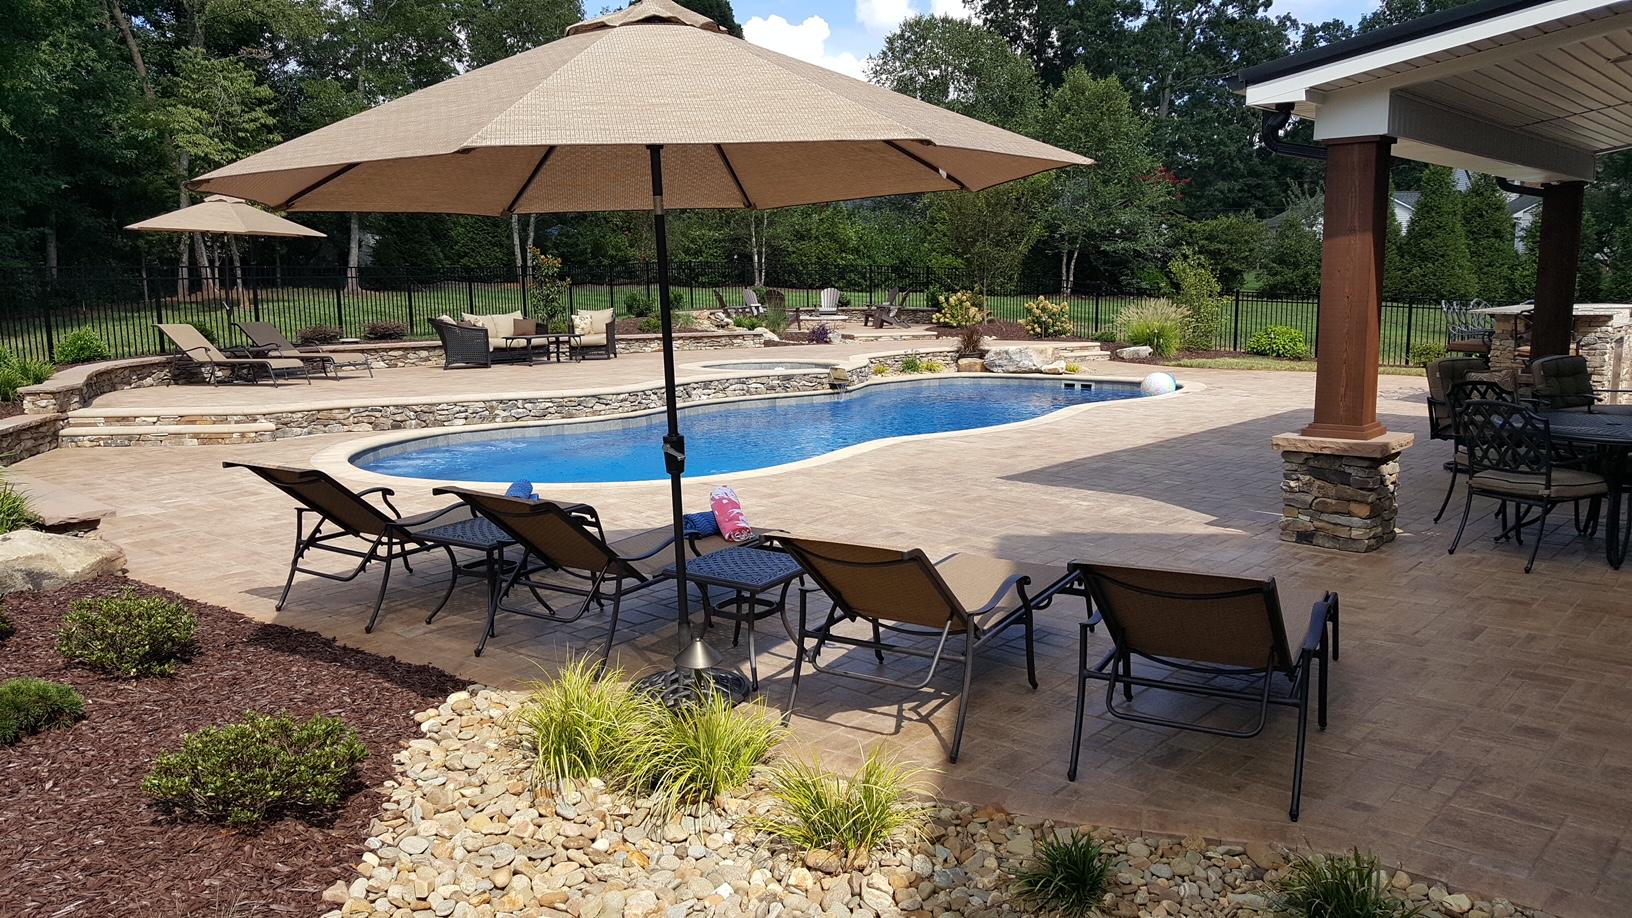 Leisure Pools Mediterranean Sapphire Blue 2016 0701 1